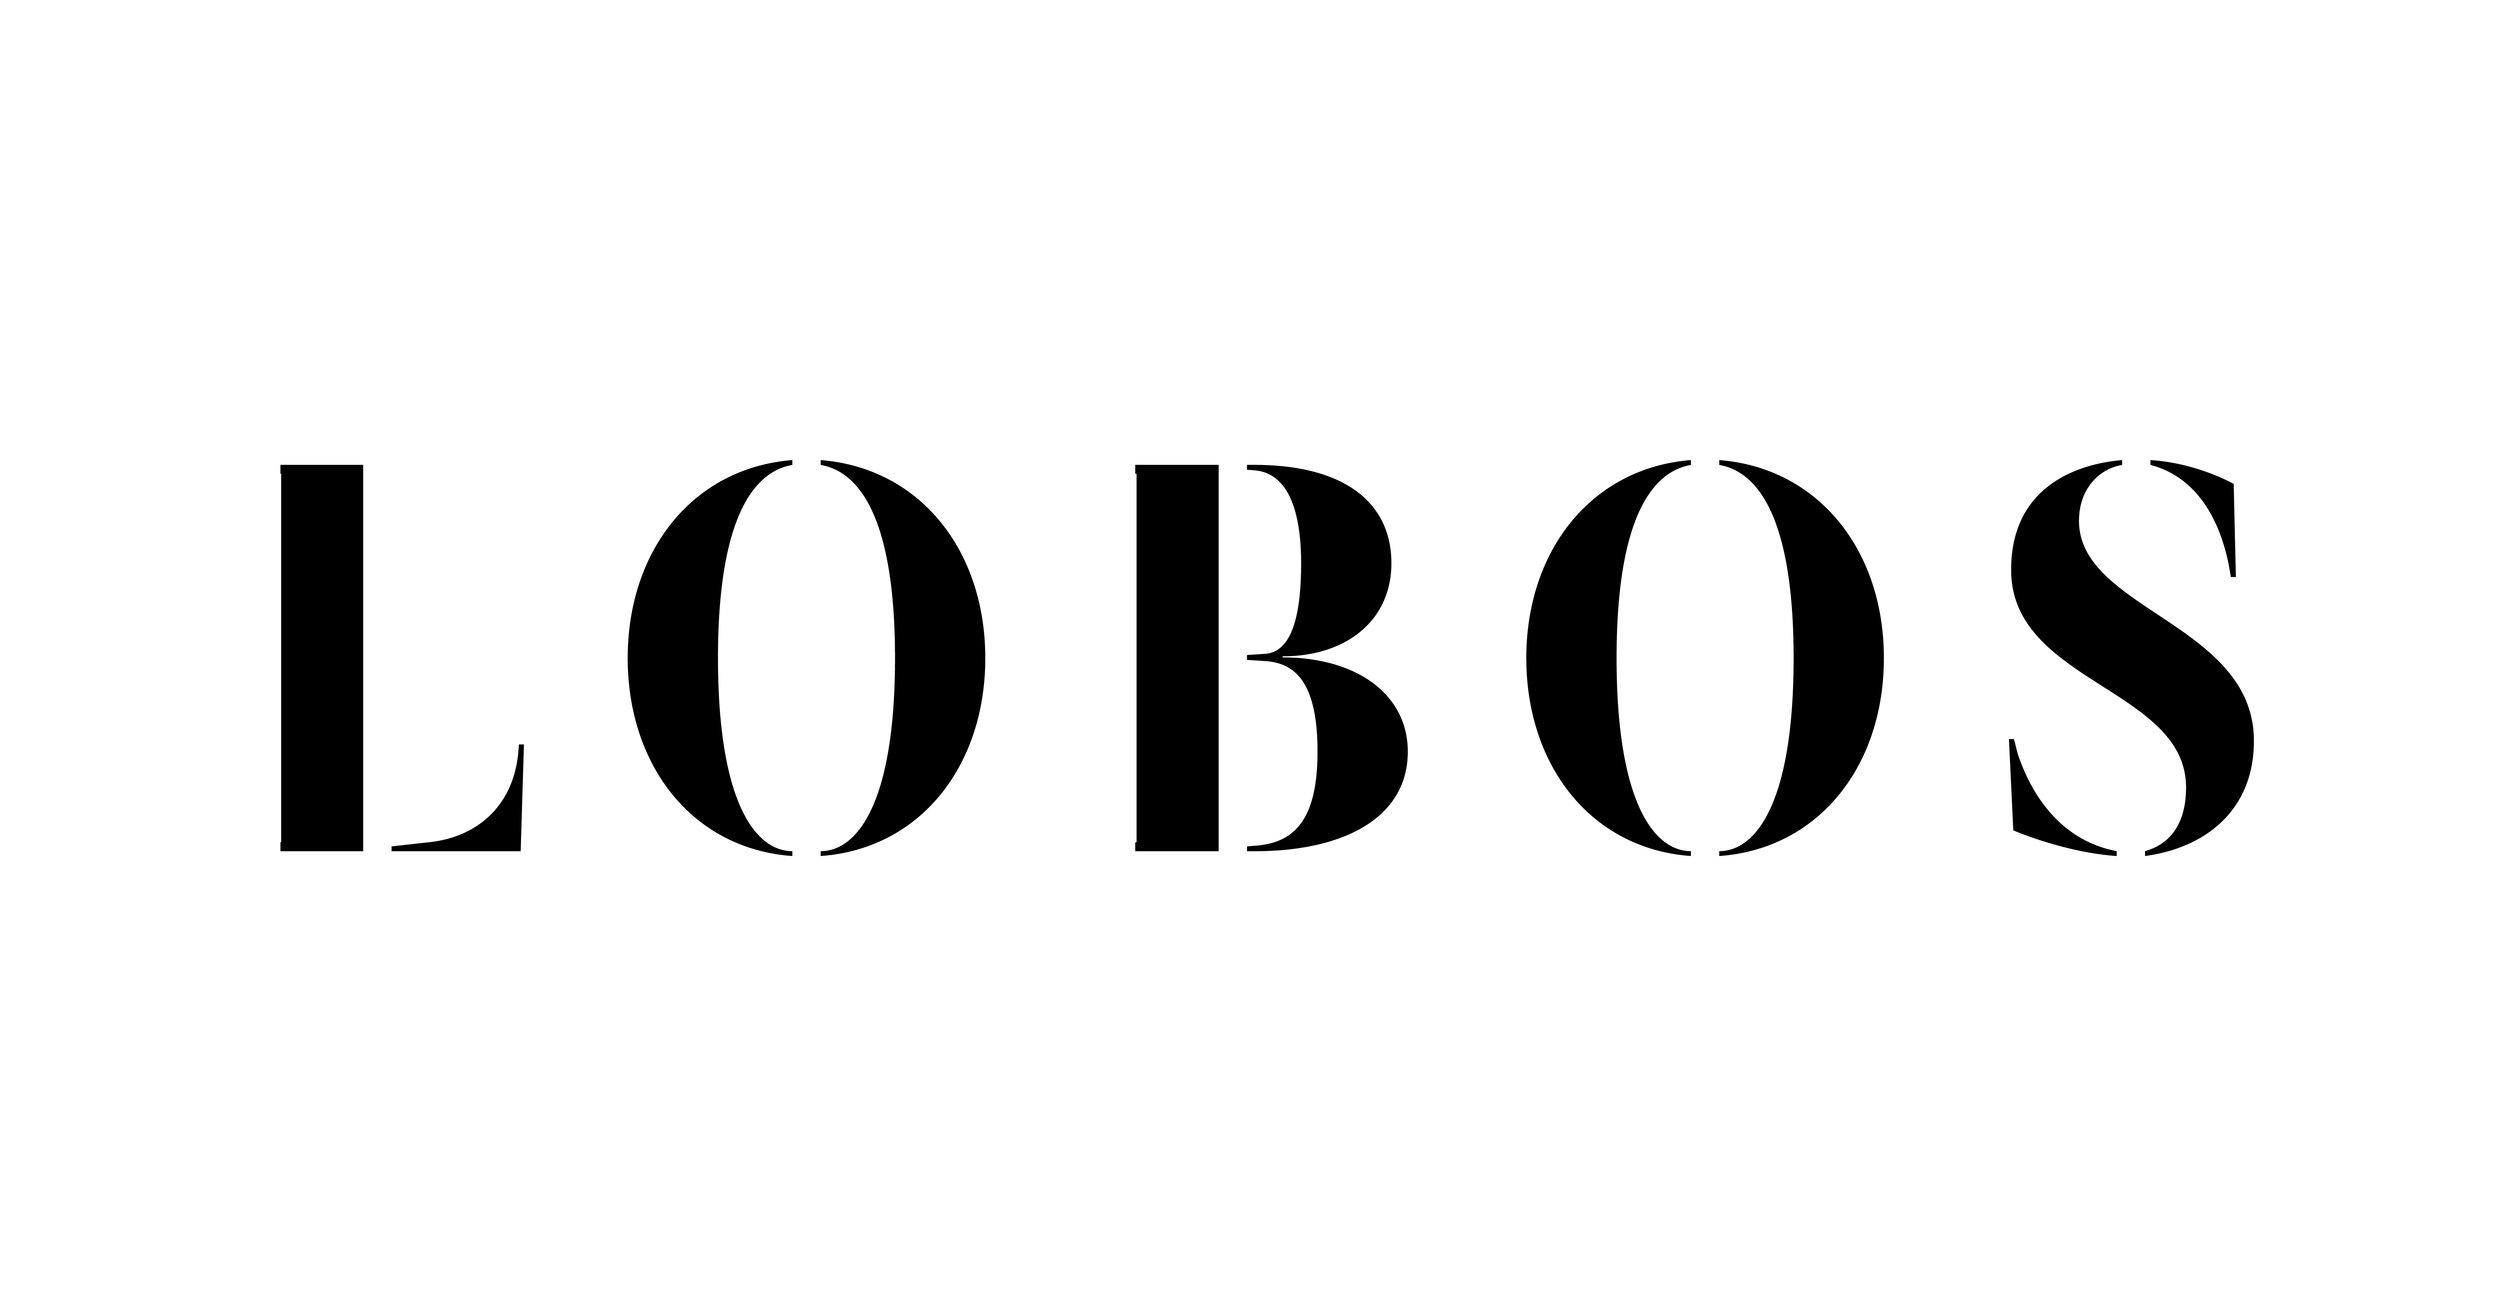 logo_lobos_web_Obszar roboczy 1.jpg